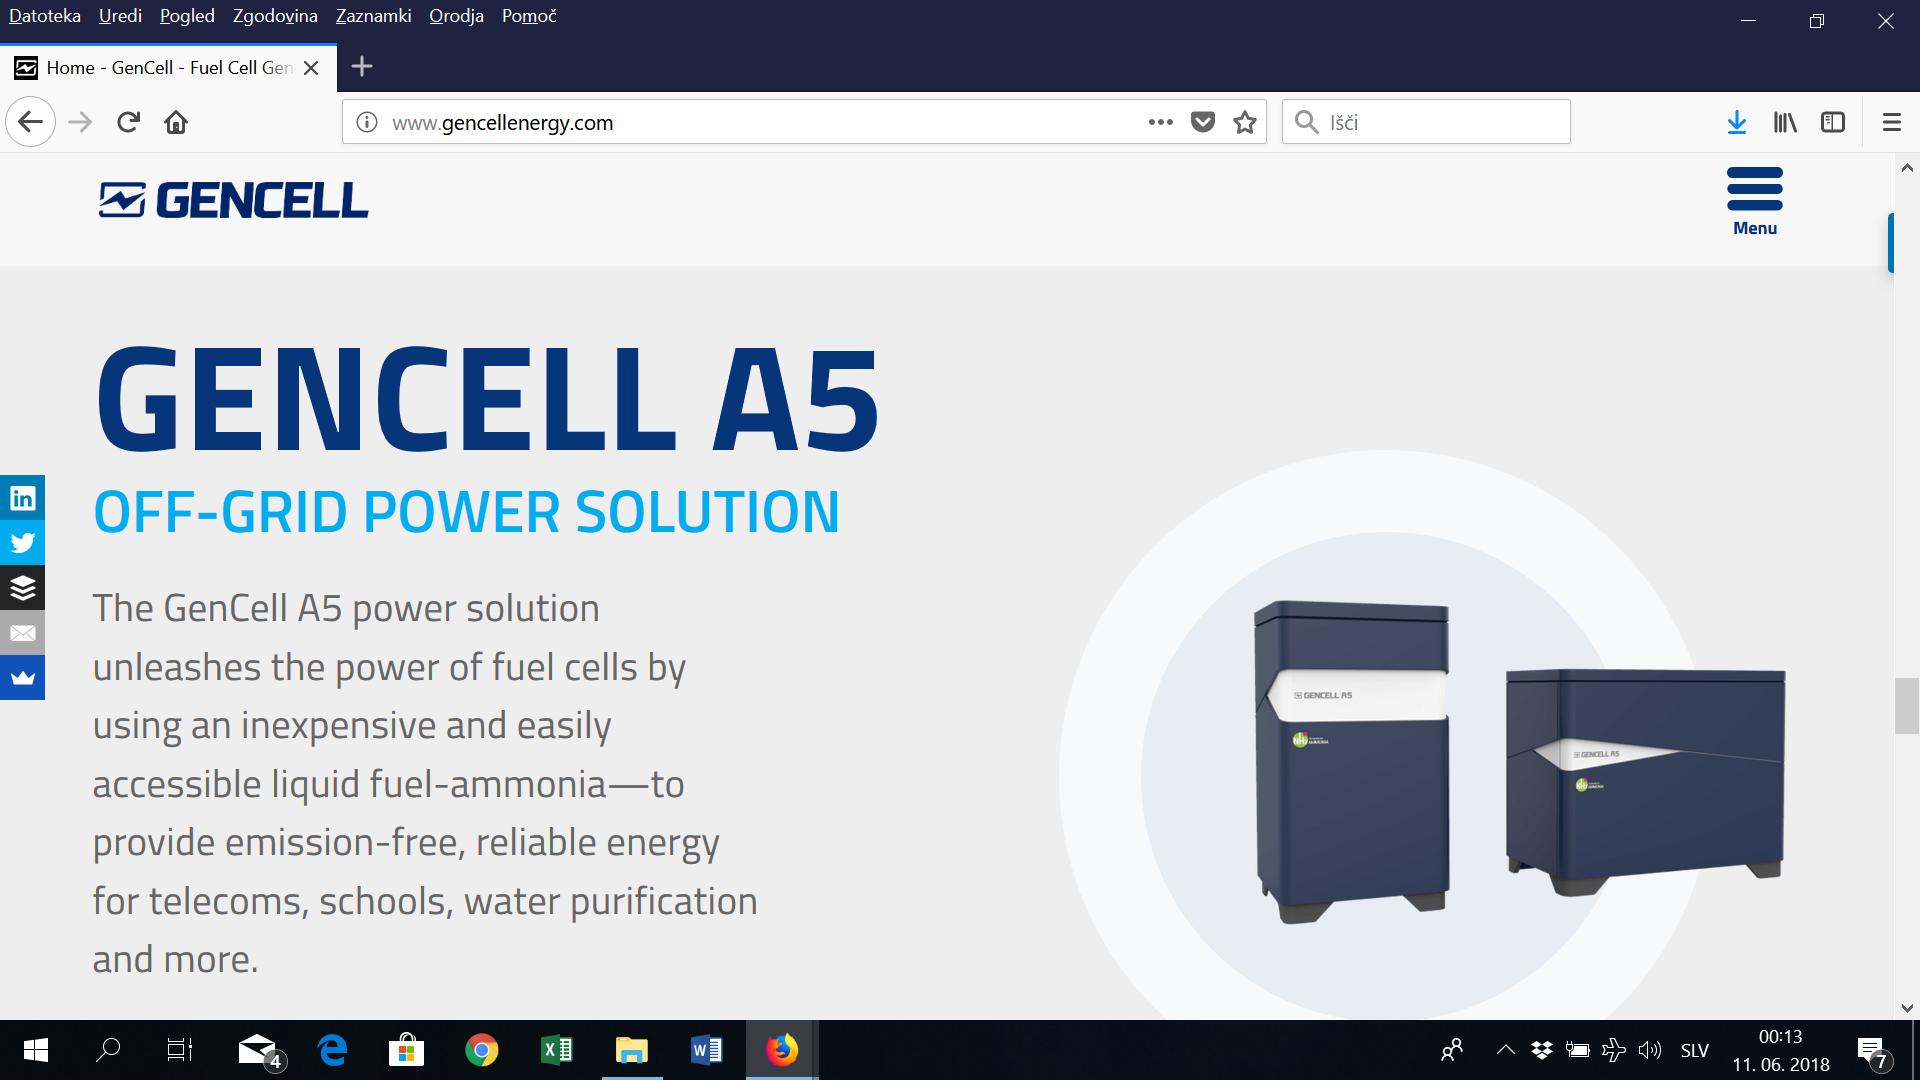 Z amonijakom do elektrike ceneje kot z dizelskim agregatom